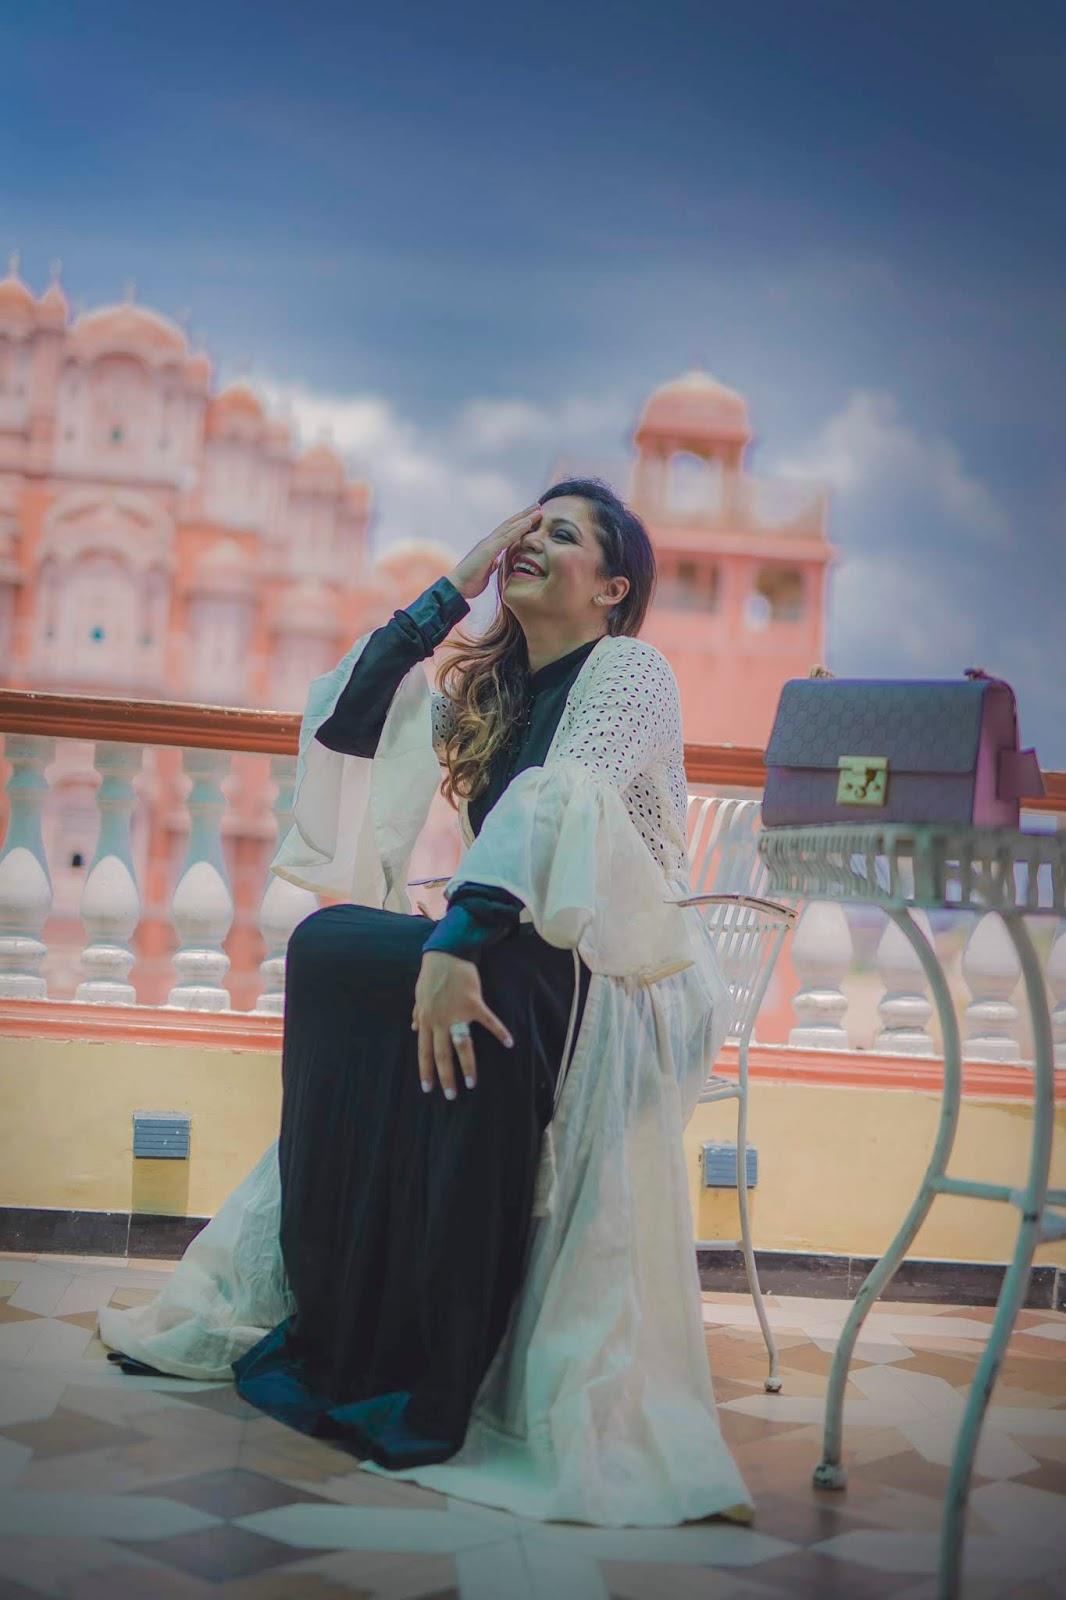 jaipur trip, travel blogger, fashion, style,. myriad musings, amor first, paprika gate, pink city trip, wanderlust, city palace, hawa mahal